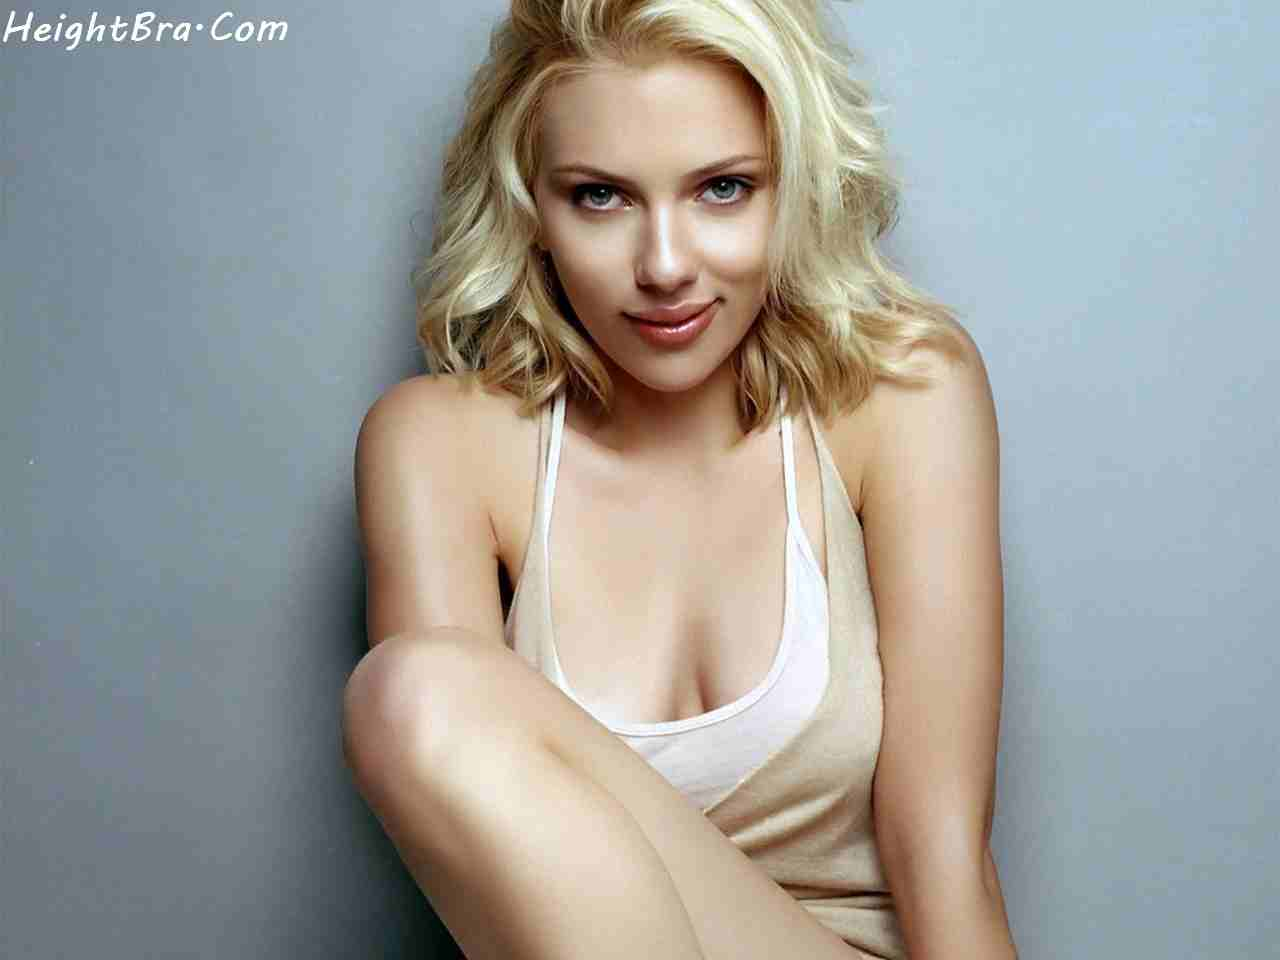 Scarlett johansson bra size criticising